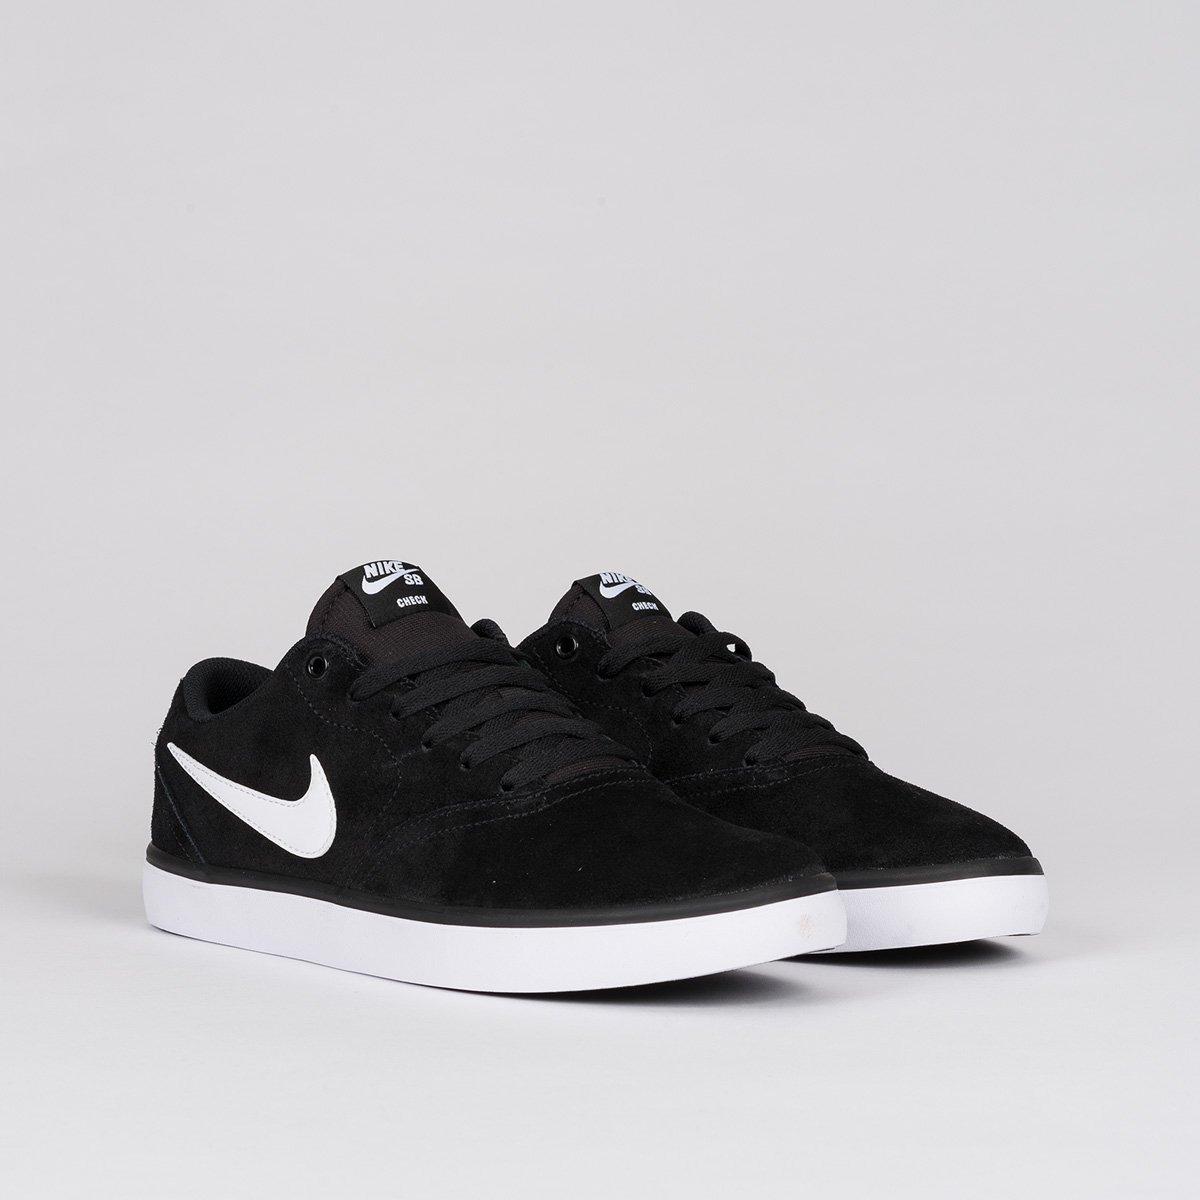 100% Original Products Nike Dunk Negras, Bambas Nike Blancas